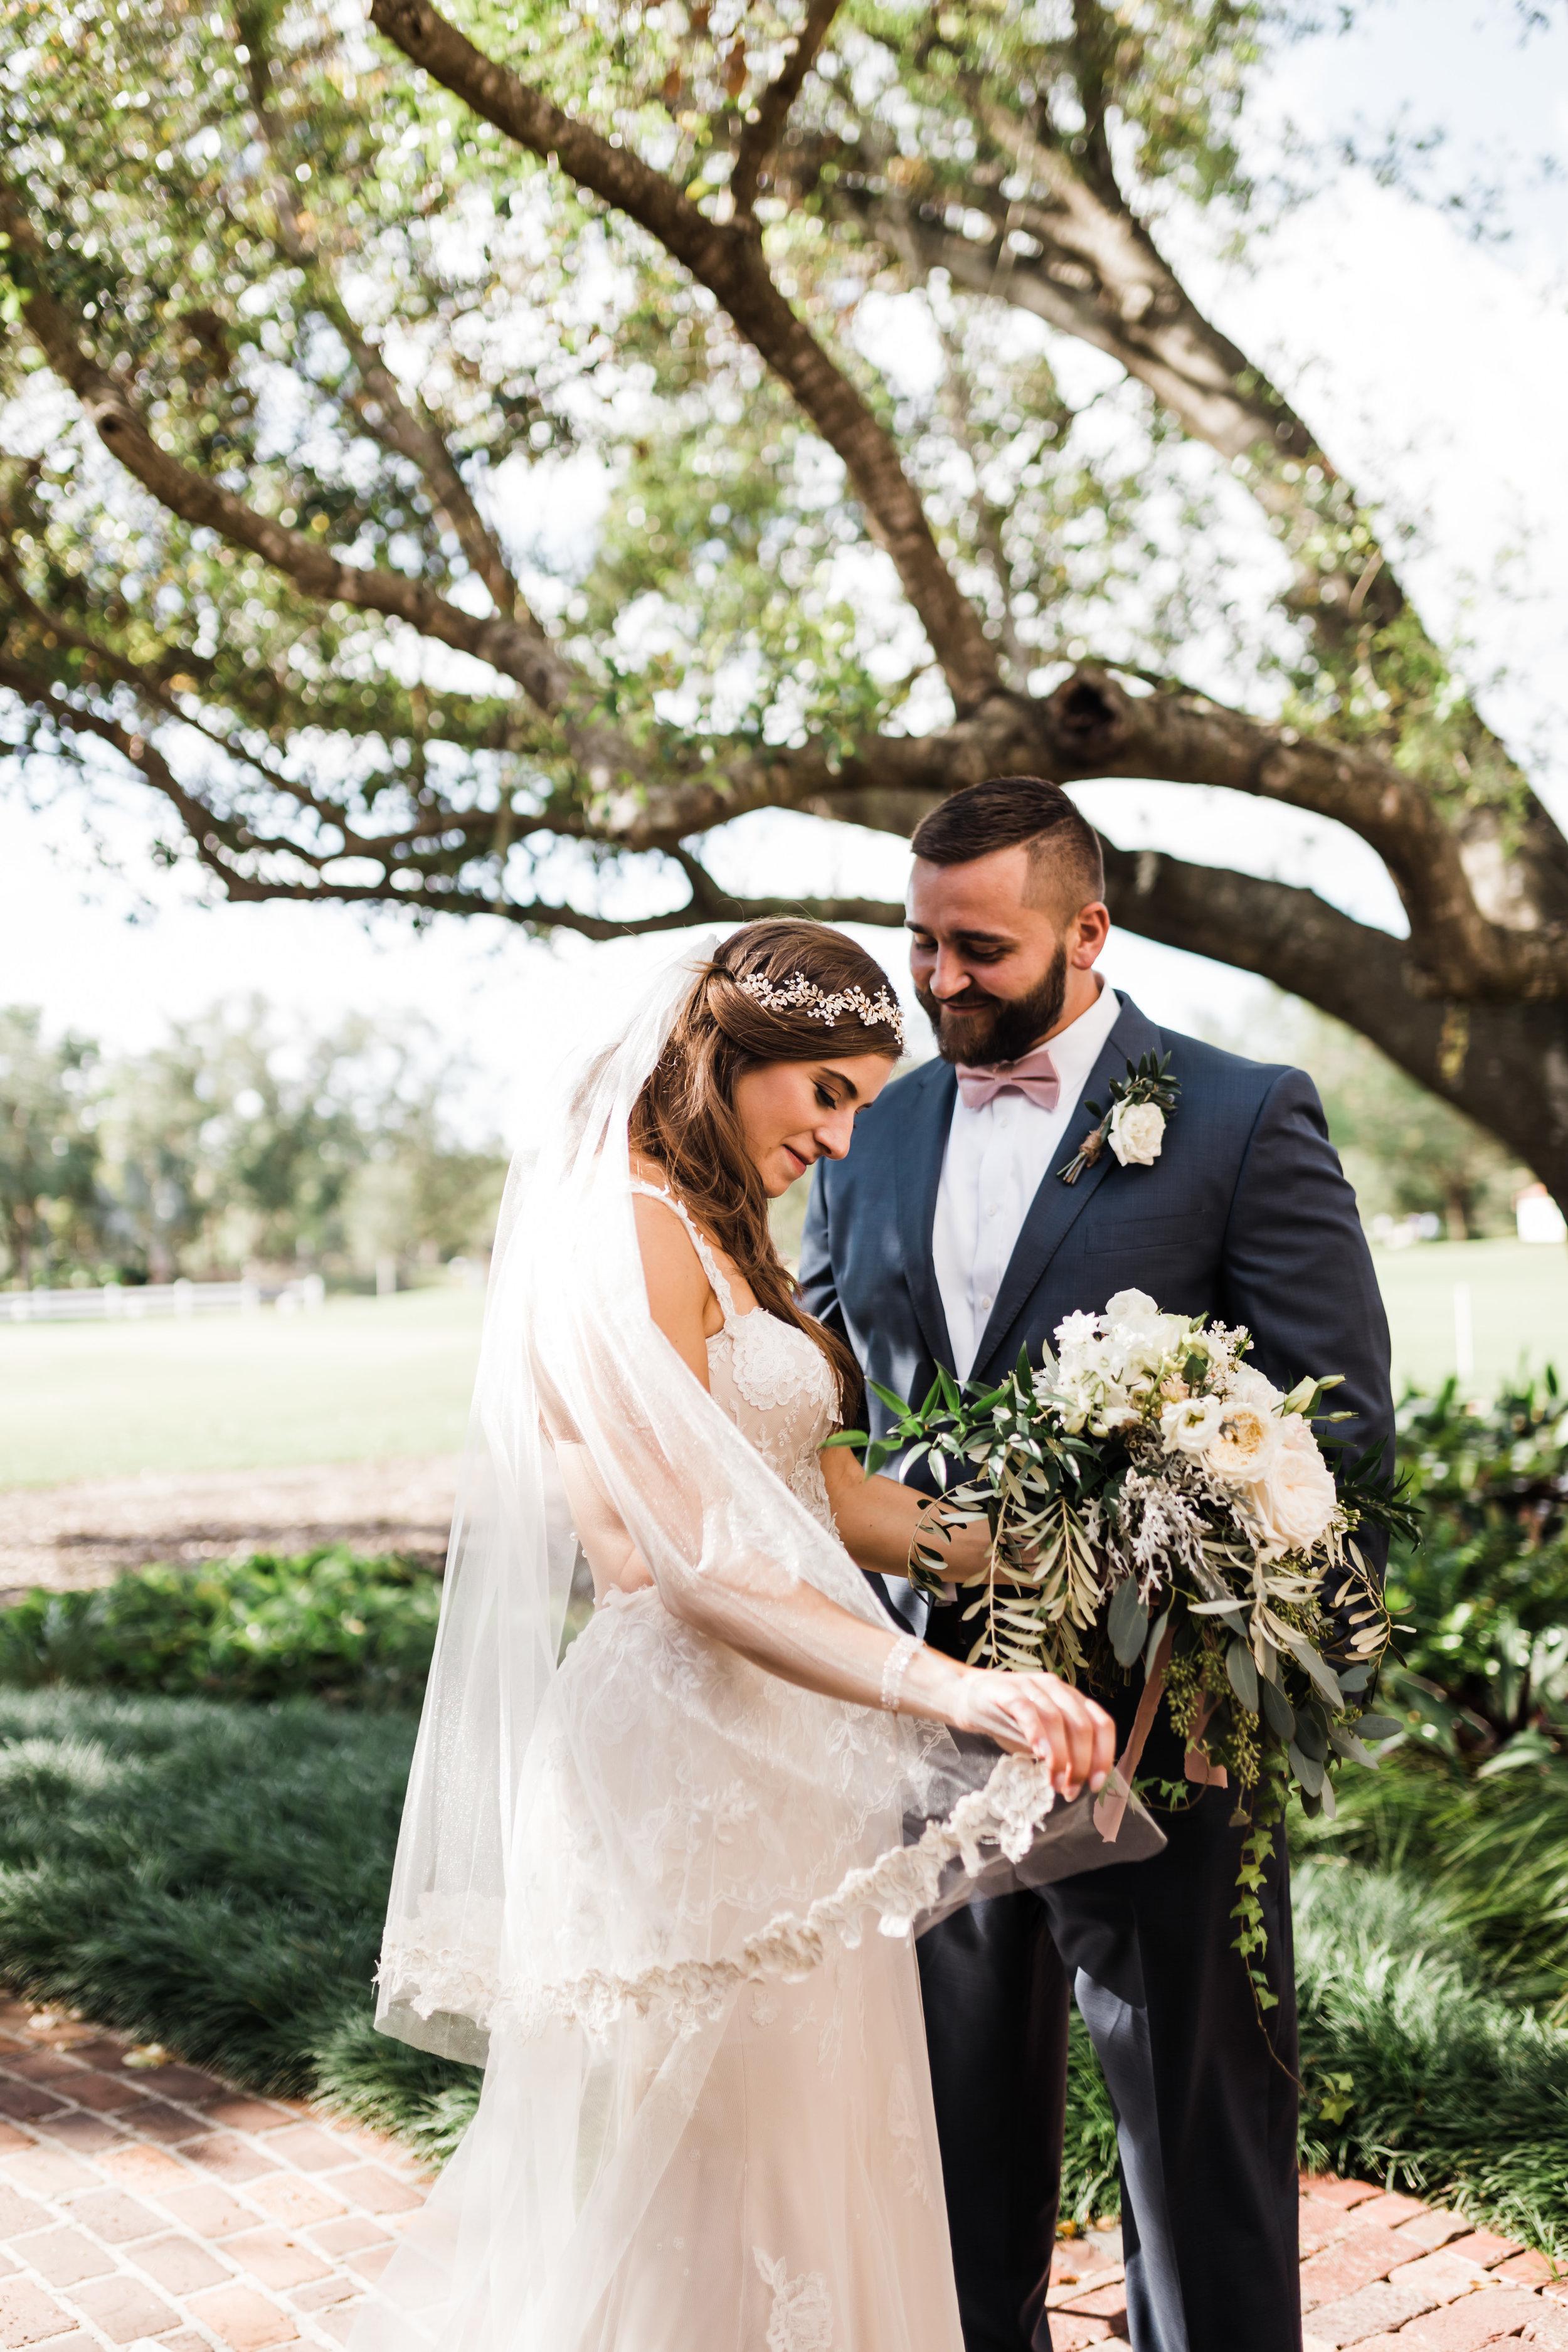 2017.10.15 Steffi and Elliott Simmonds Casa Feliz Wedding (215 of 969).jpg